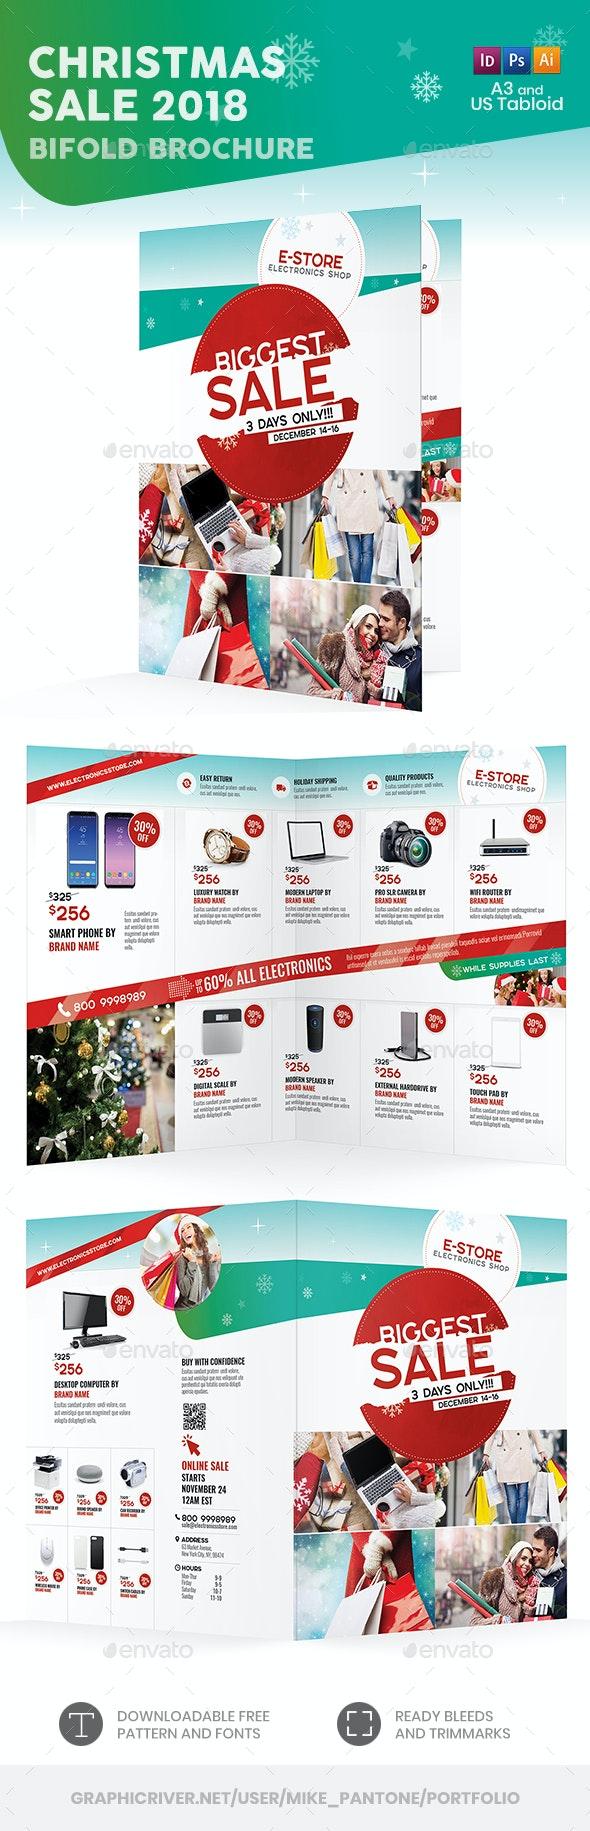 Christmas Sale 2018 Bifold / Halffold Brochure - Informational Brochures